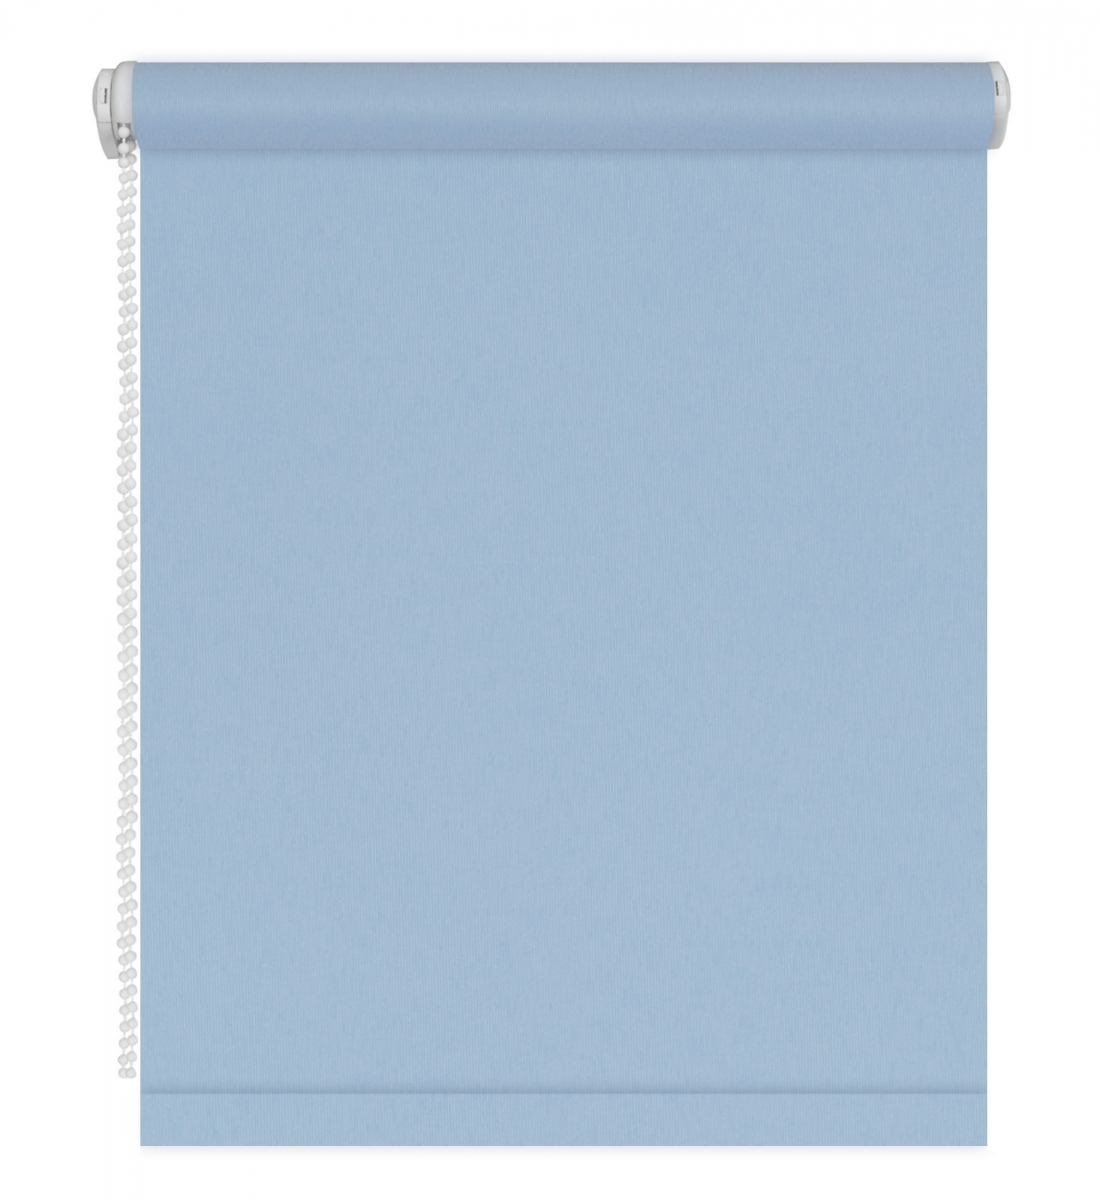 Рулонные шторы Shevon Цвет: Голубой